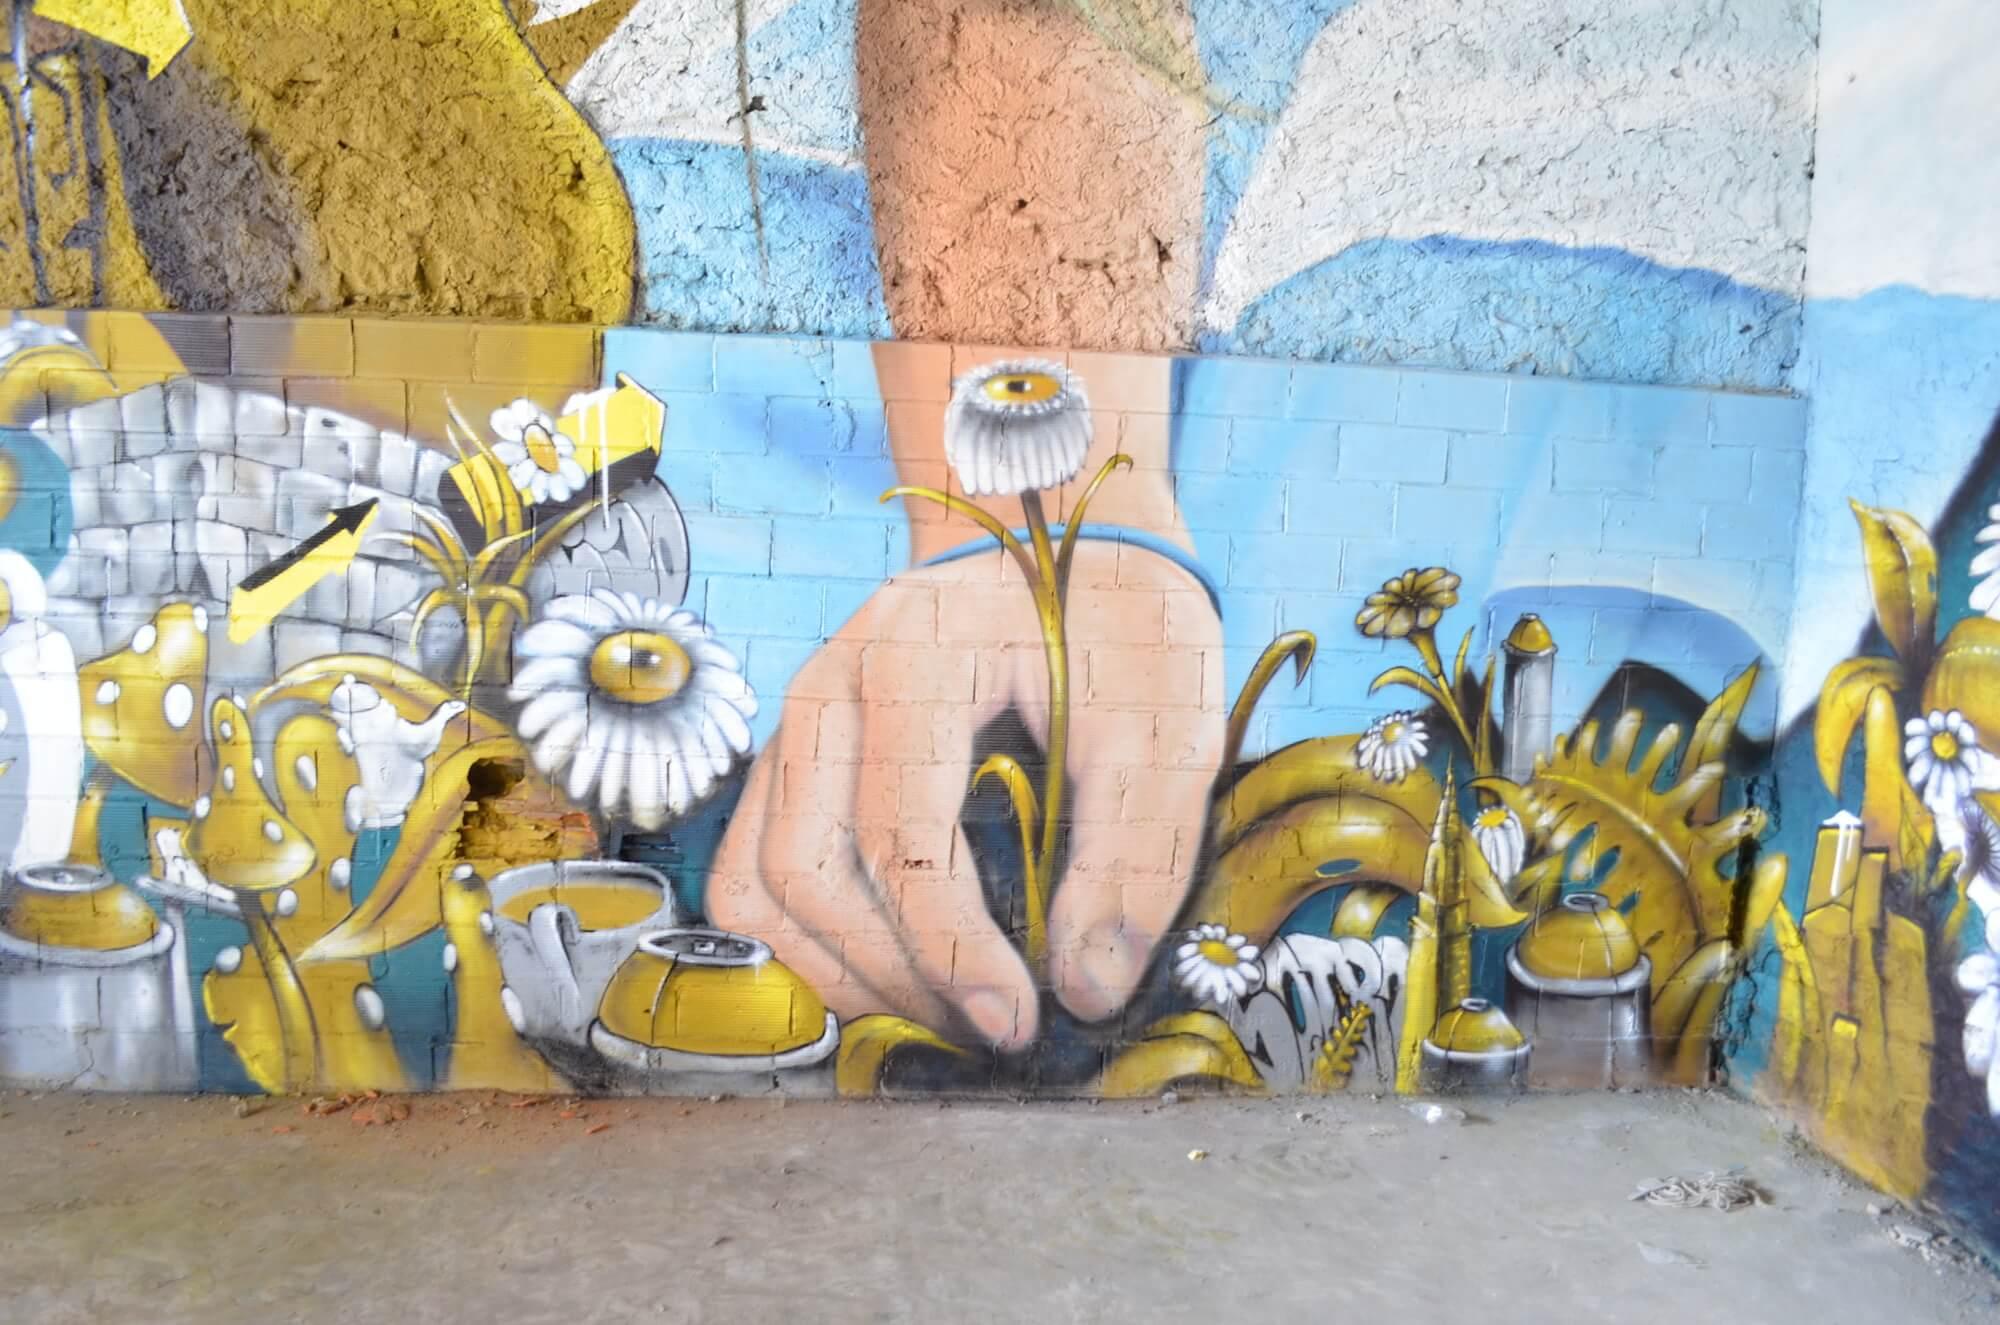 Street Artists BKfoxx and Zeso paint Alices Wonderland 2017